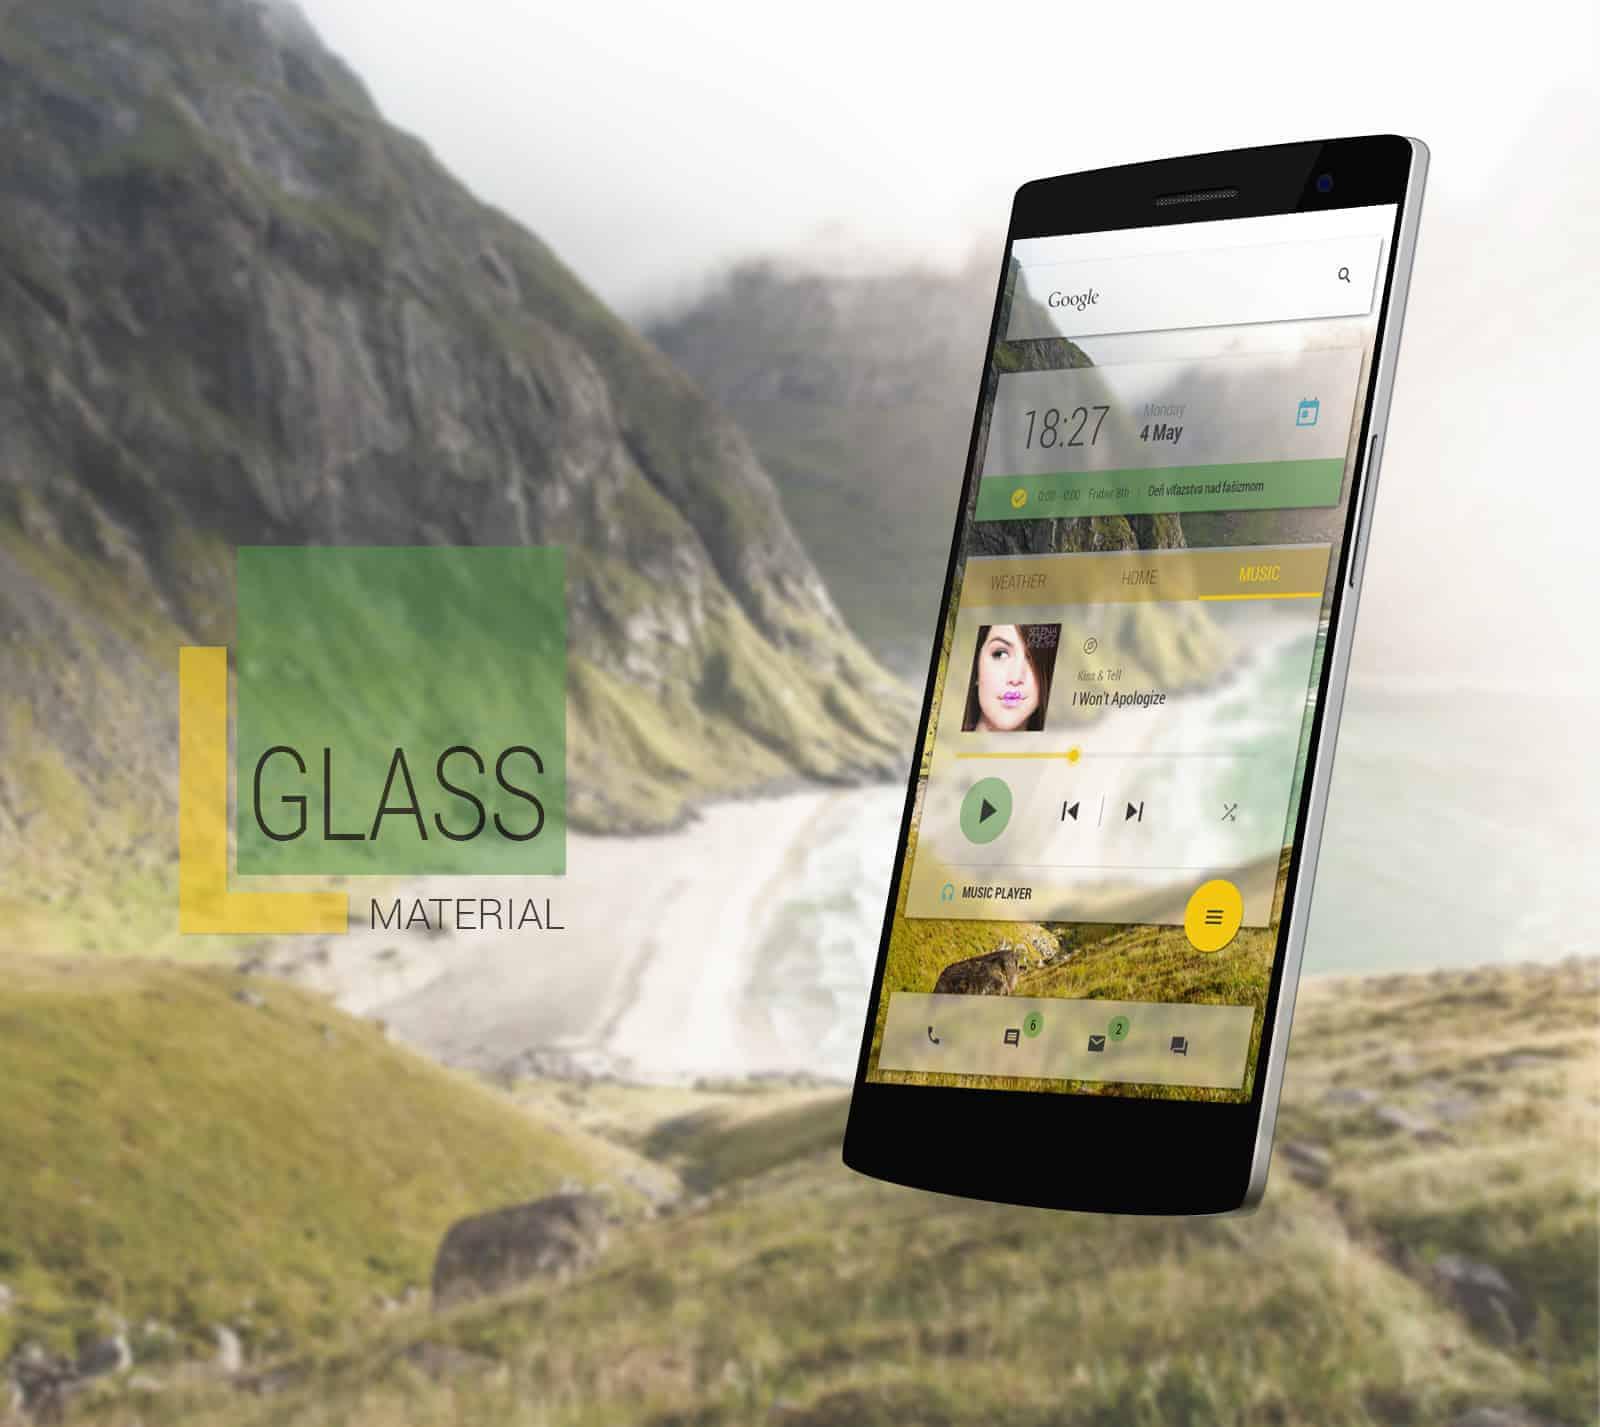 GlassMaterialMusic2_original